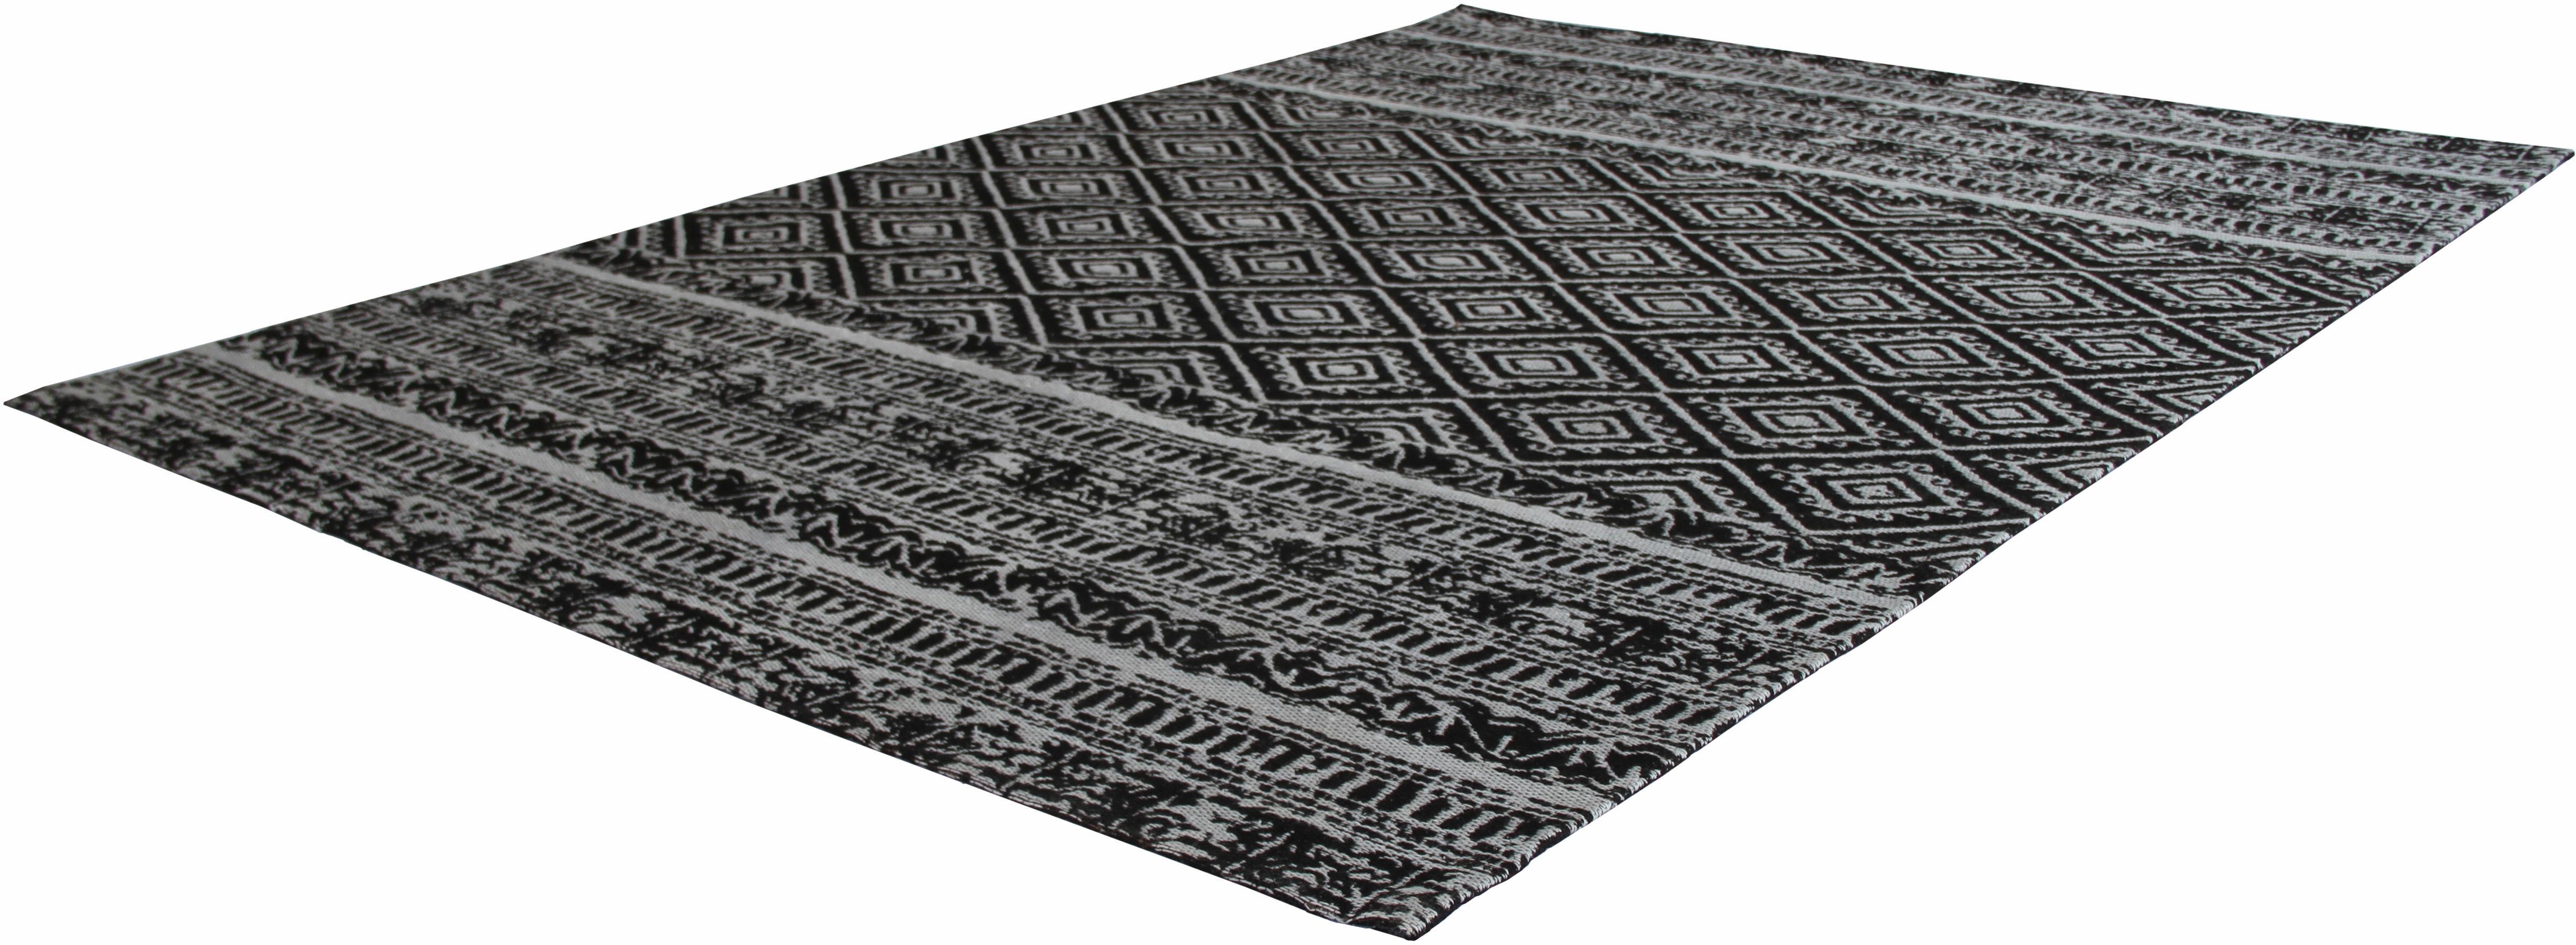 Teppich Sunny 110 Kayoom rechteckig Höhe 5 mm handgewebt